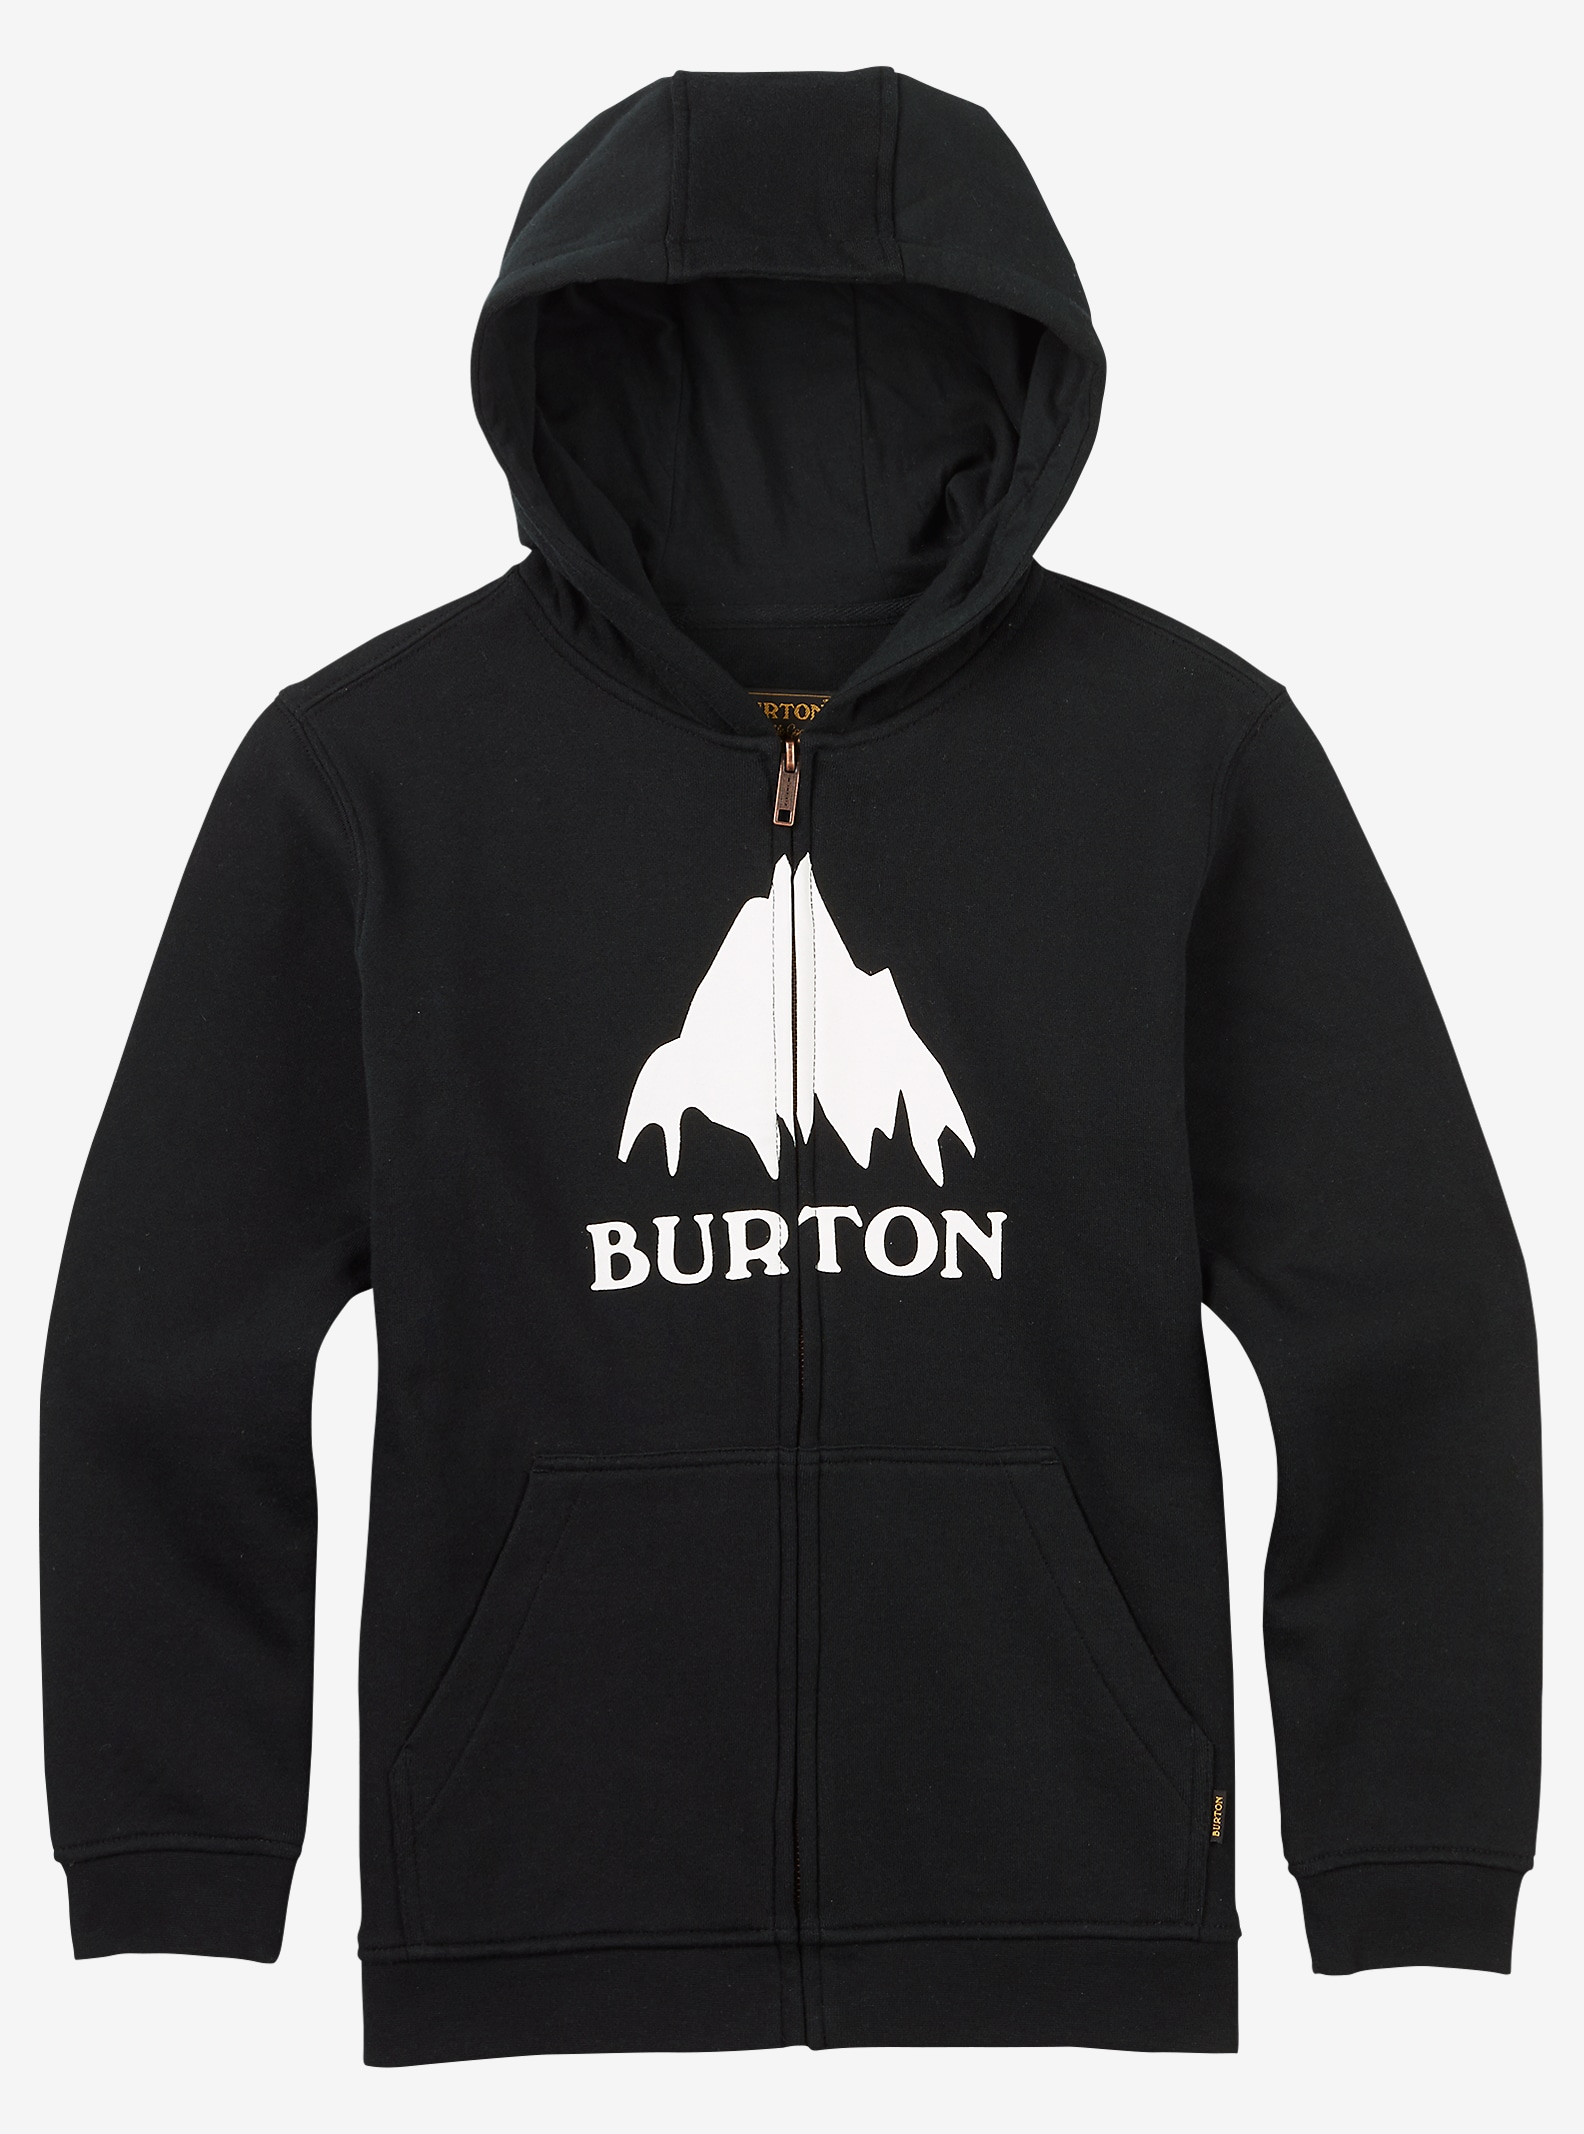 Burton Classic Mountain Full-Zip Hoodie shown in True Black